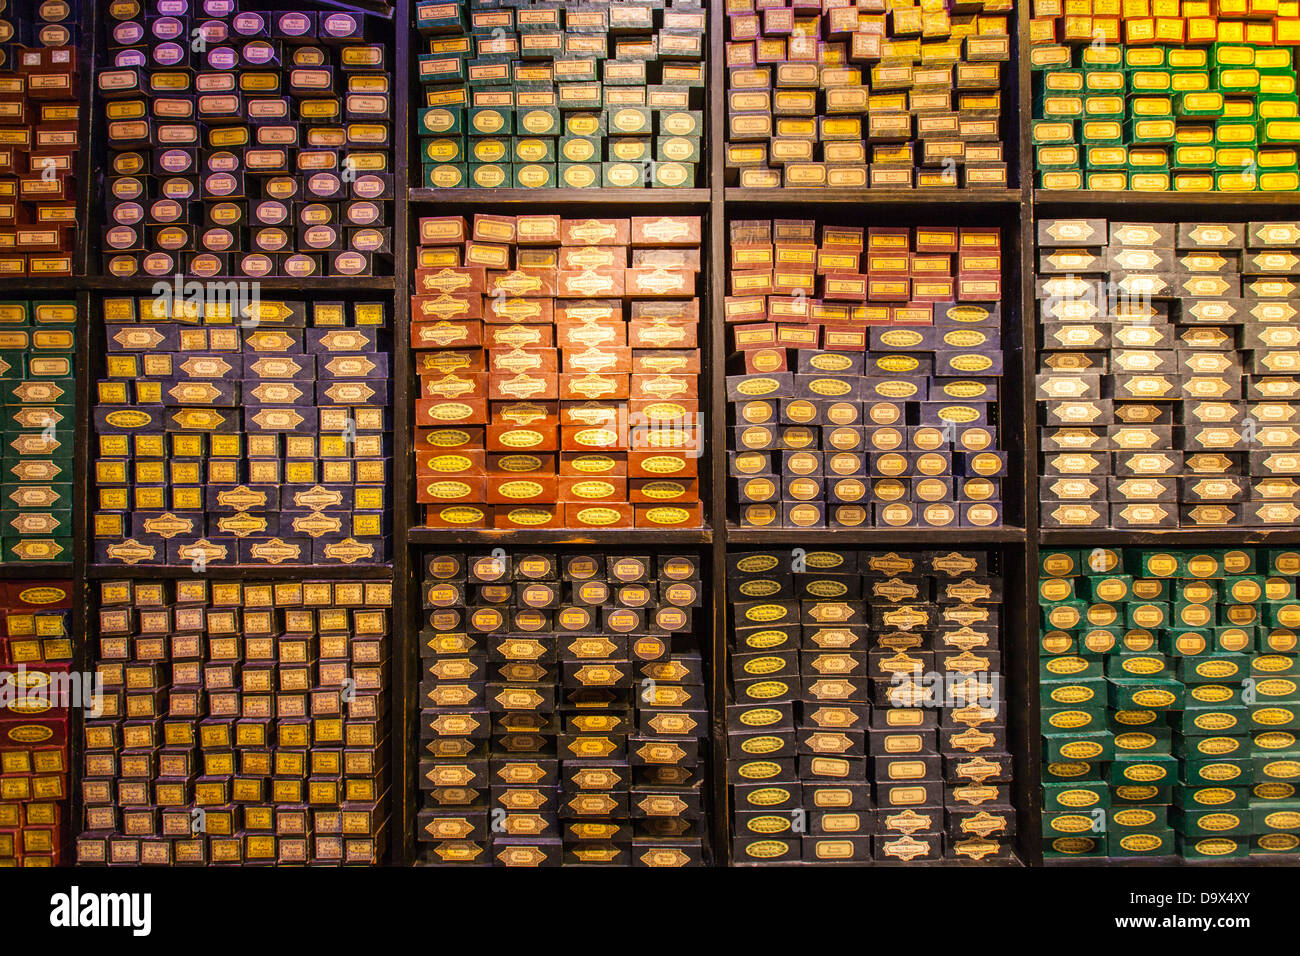 Harry Potter Wand Boxes Stock Photo  57737651 - Alamy dcb225f0191f